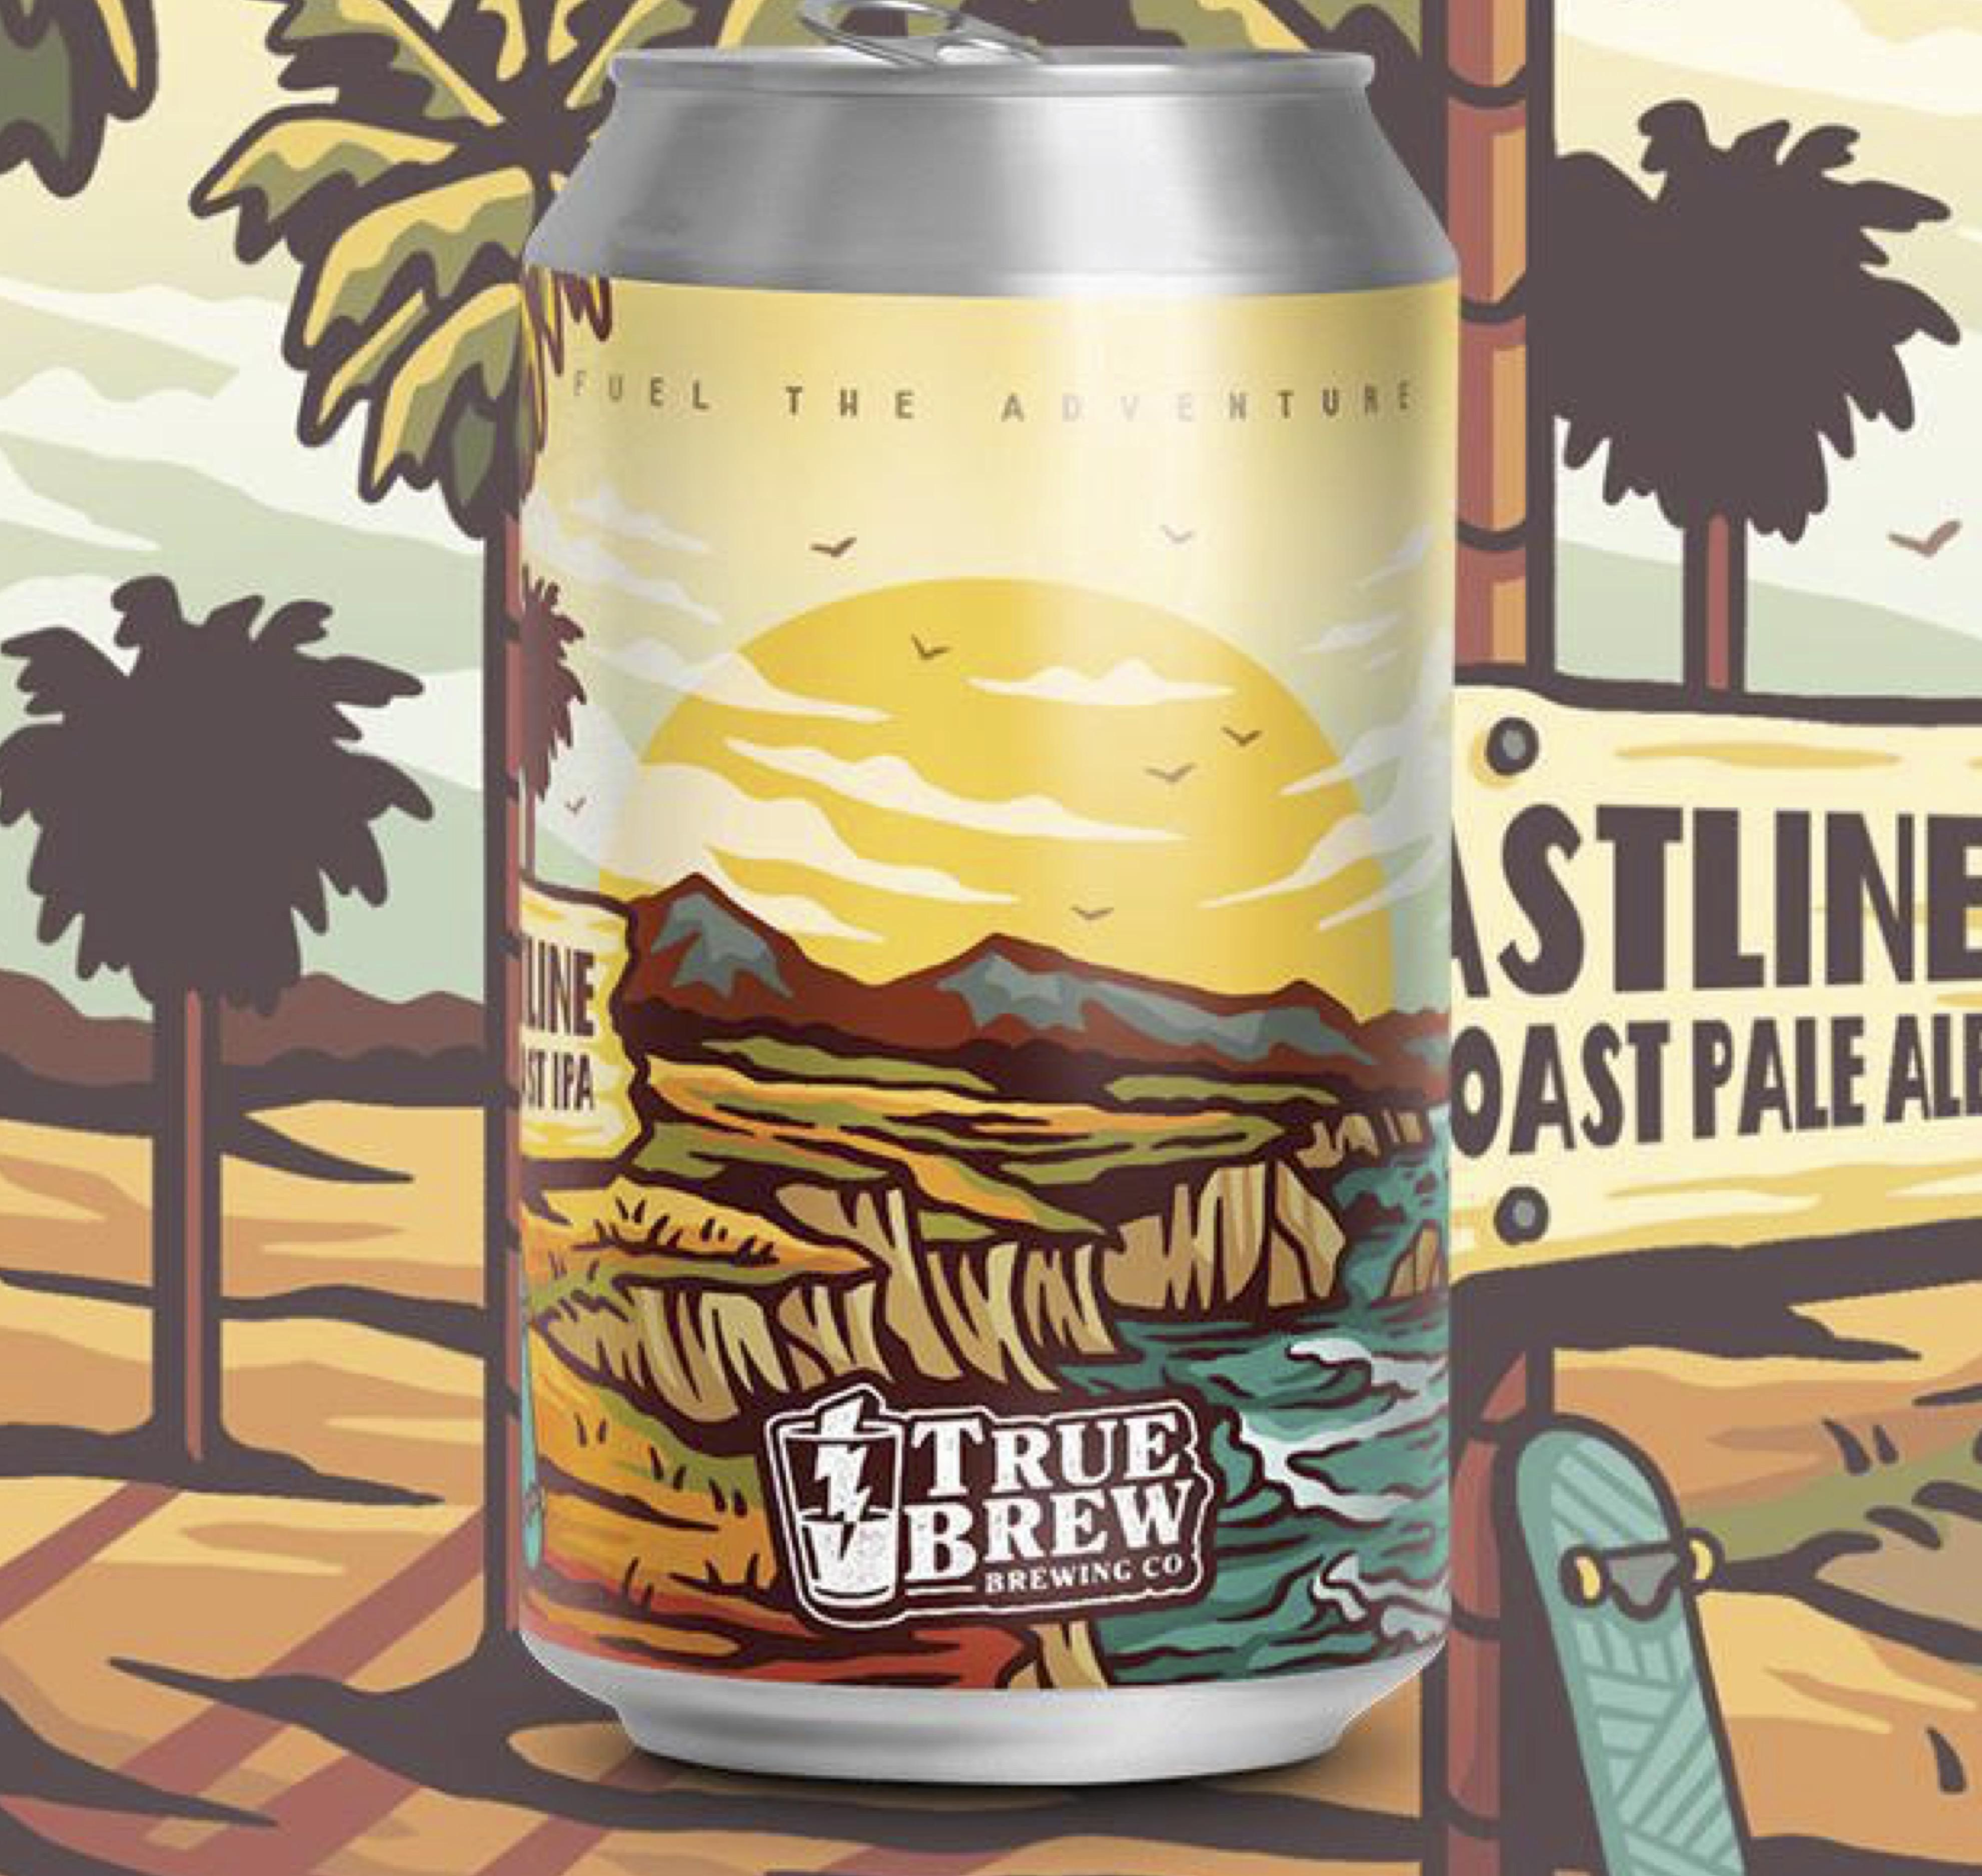 True Brew - Coastline West Coast Paleale 5.3% 330 can